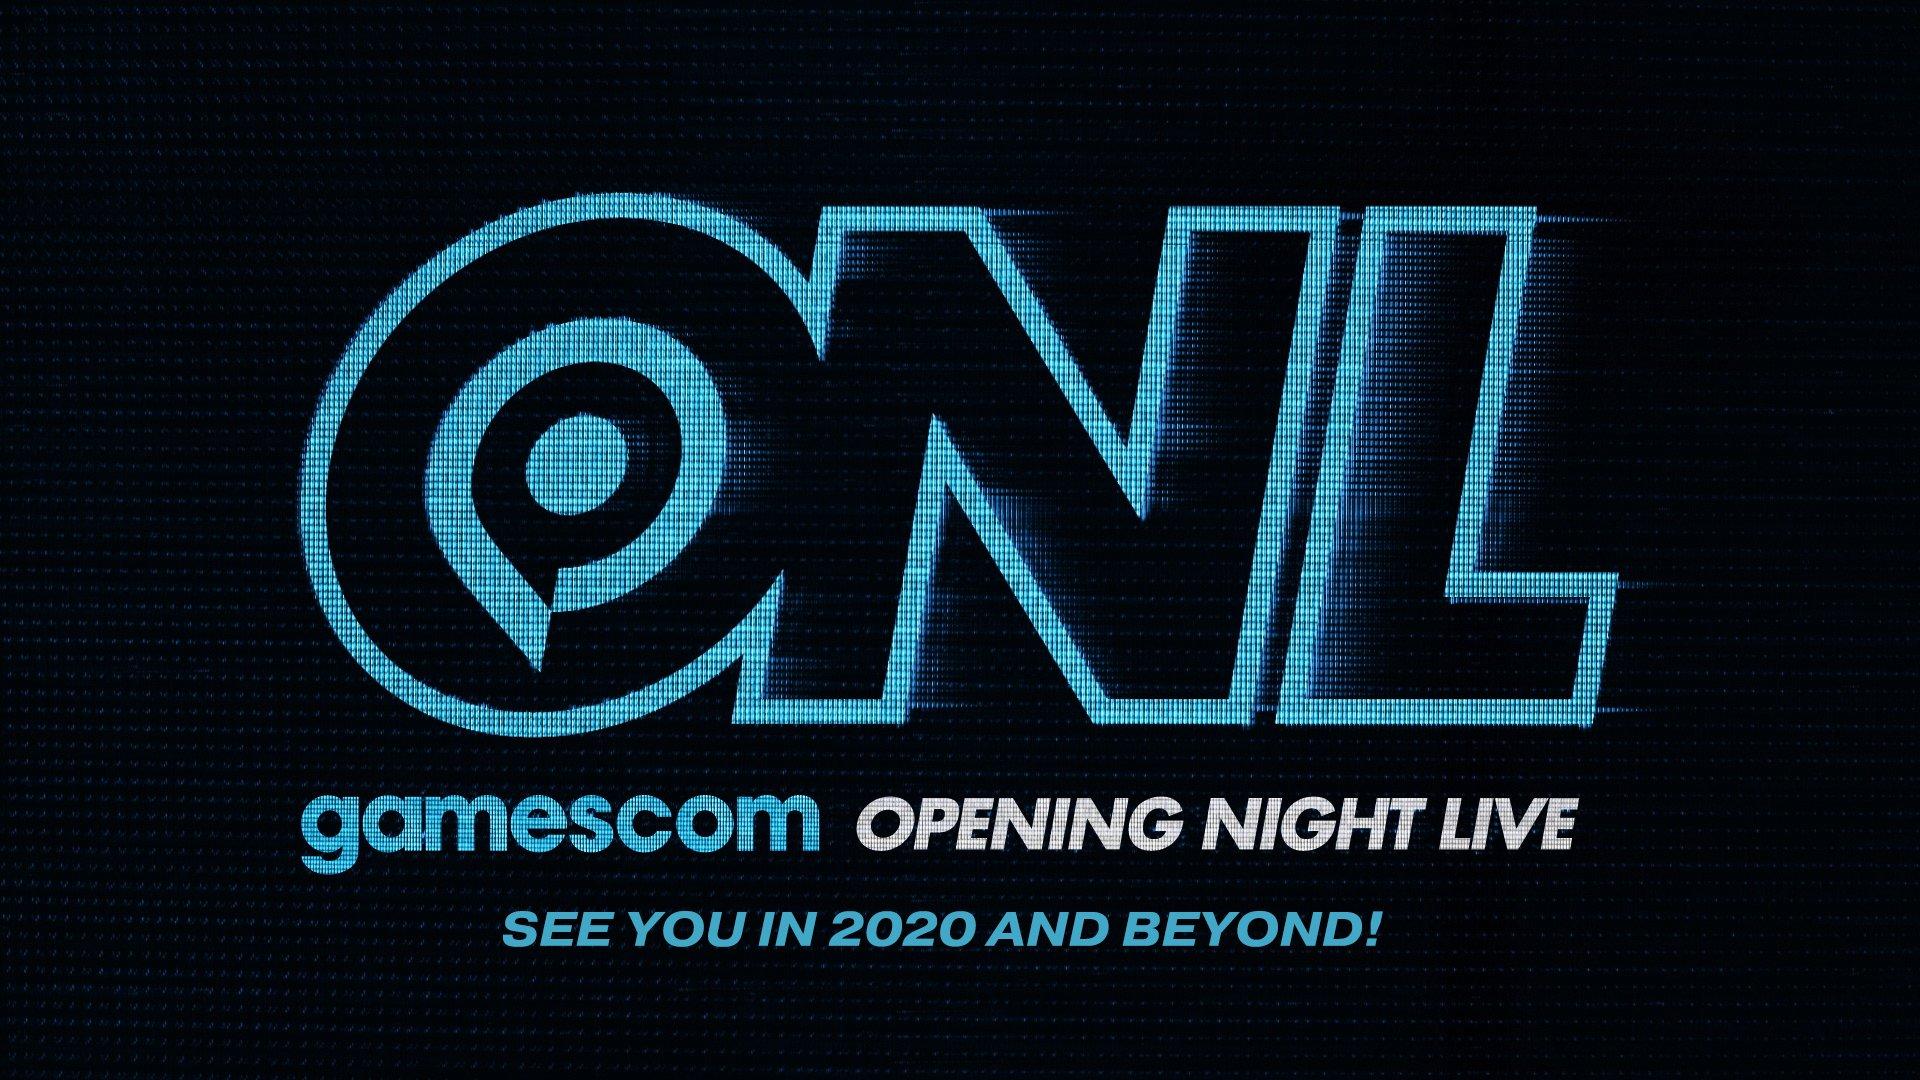 gamescom Opening Night Live 2020